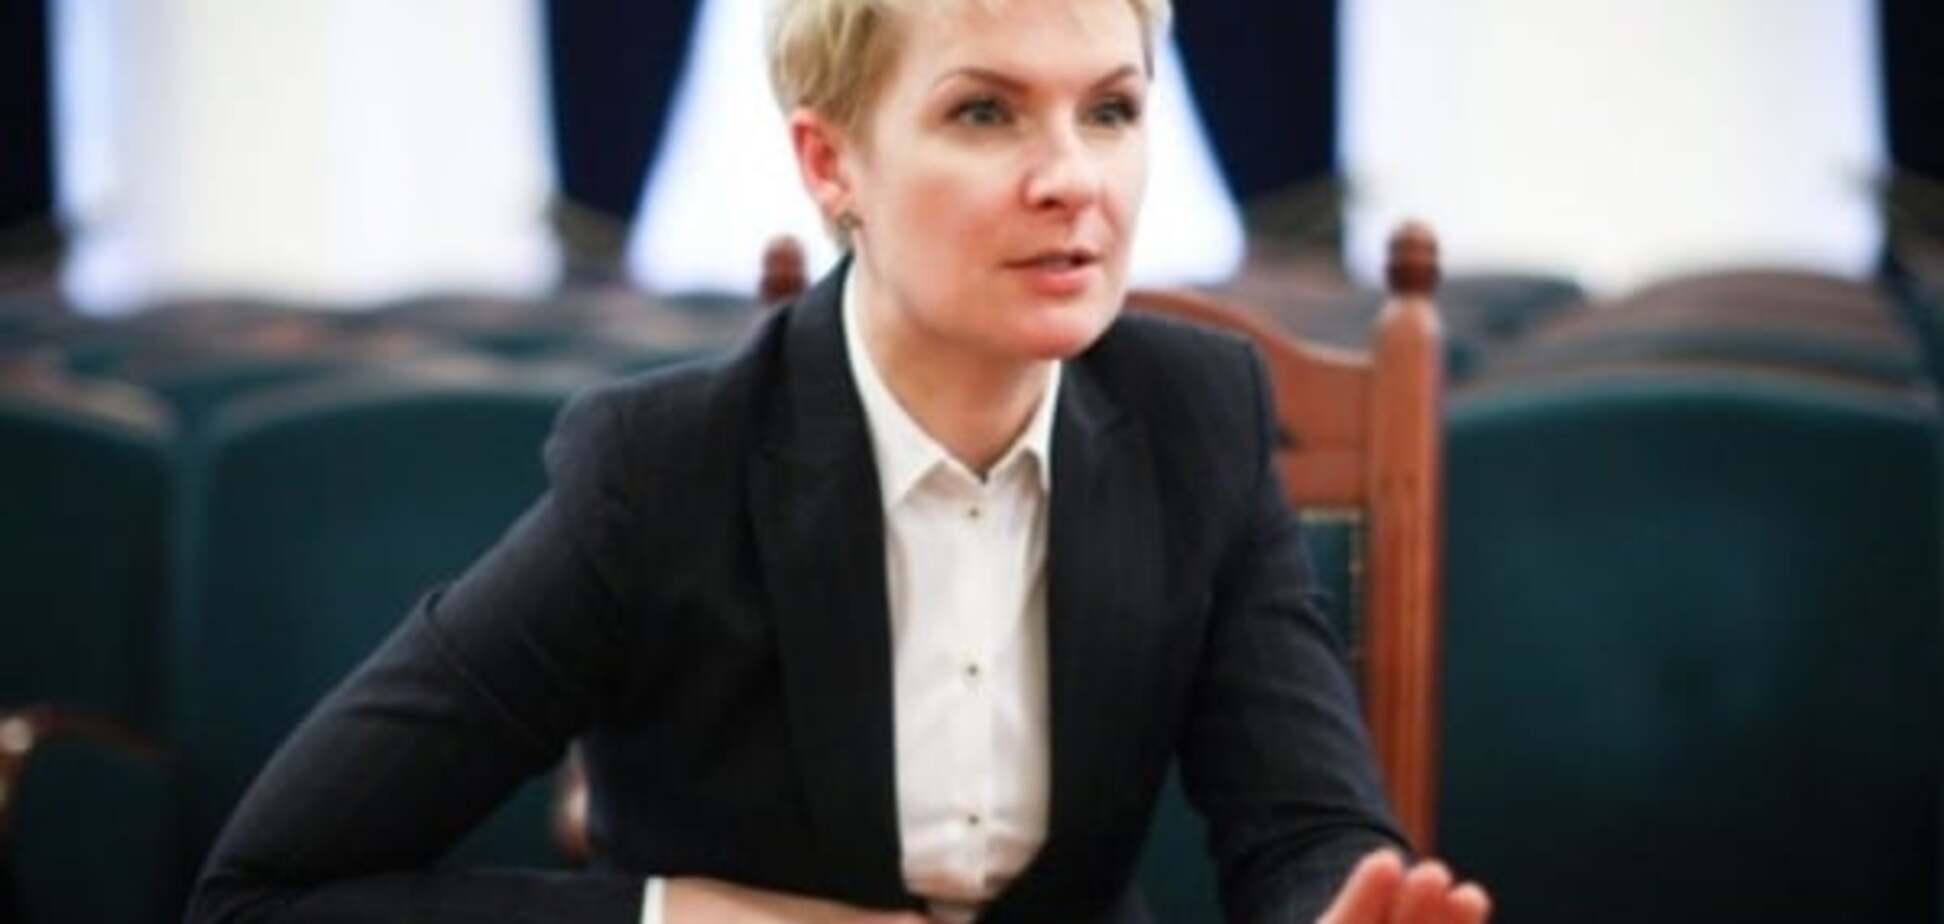 Головний люстратор України 'засвітилася' в 'панамських документах'